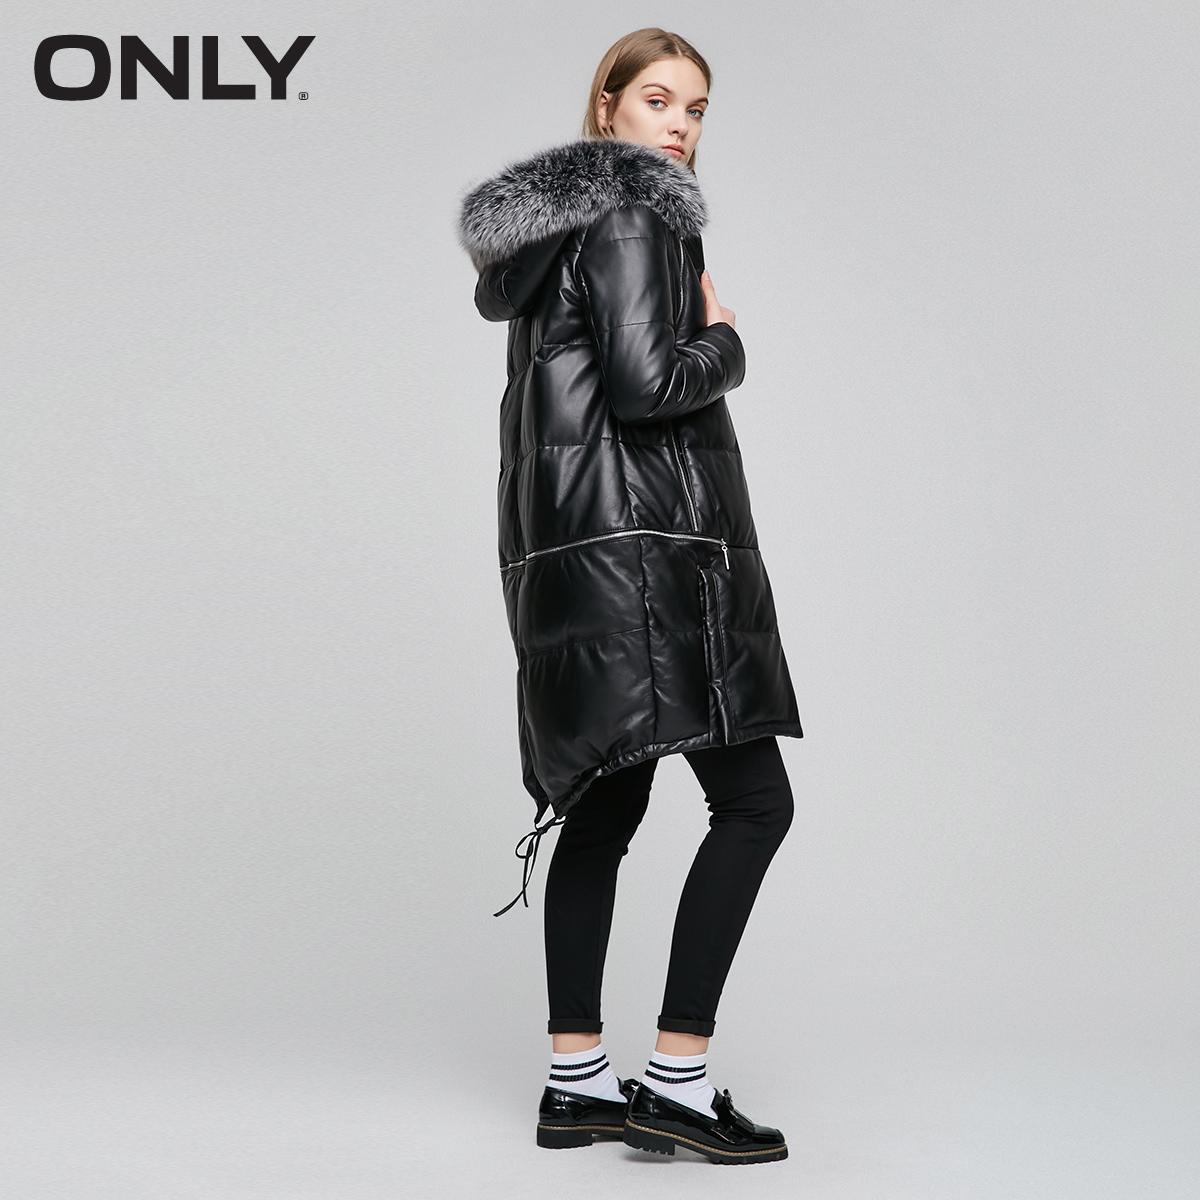 Кожаная куртка ONLY 116428505 3299ONLY